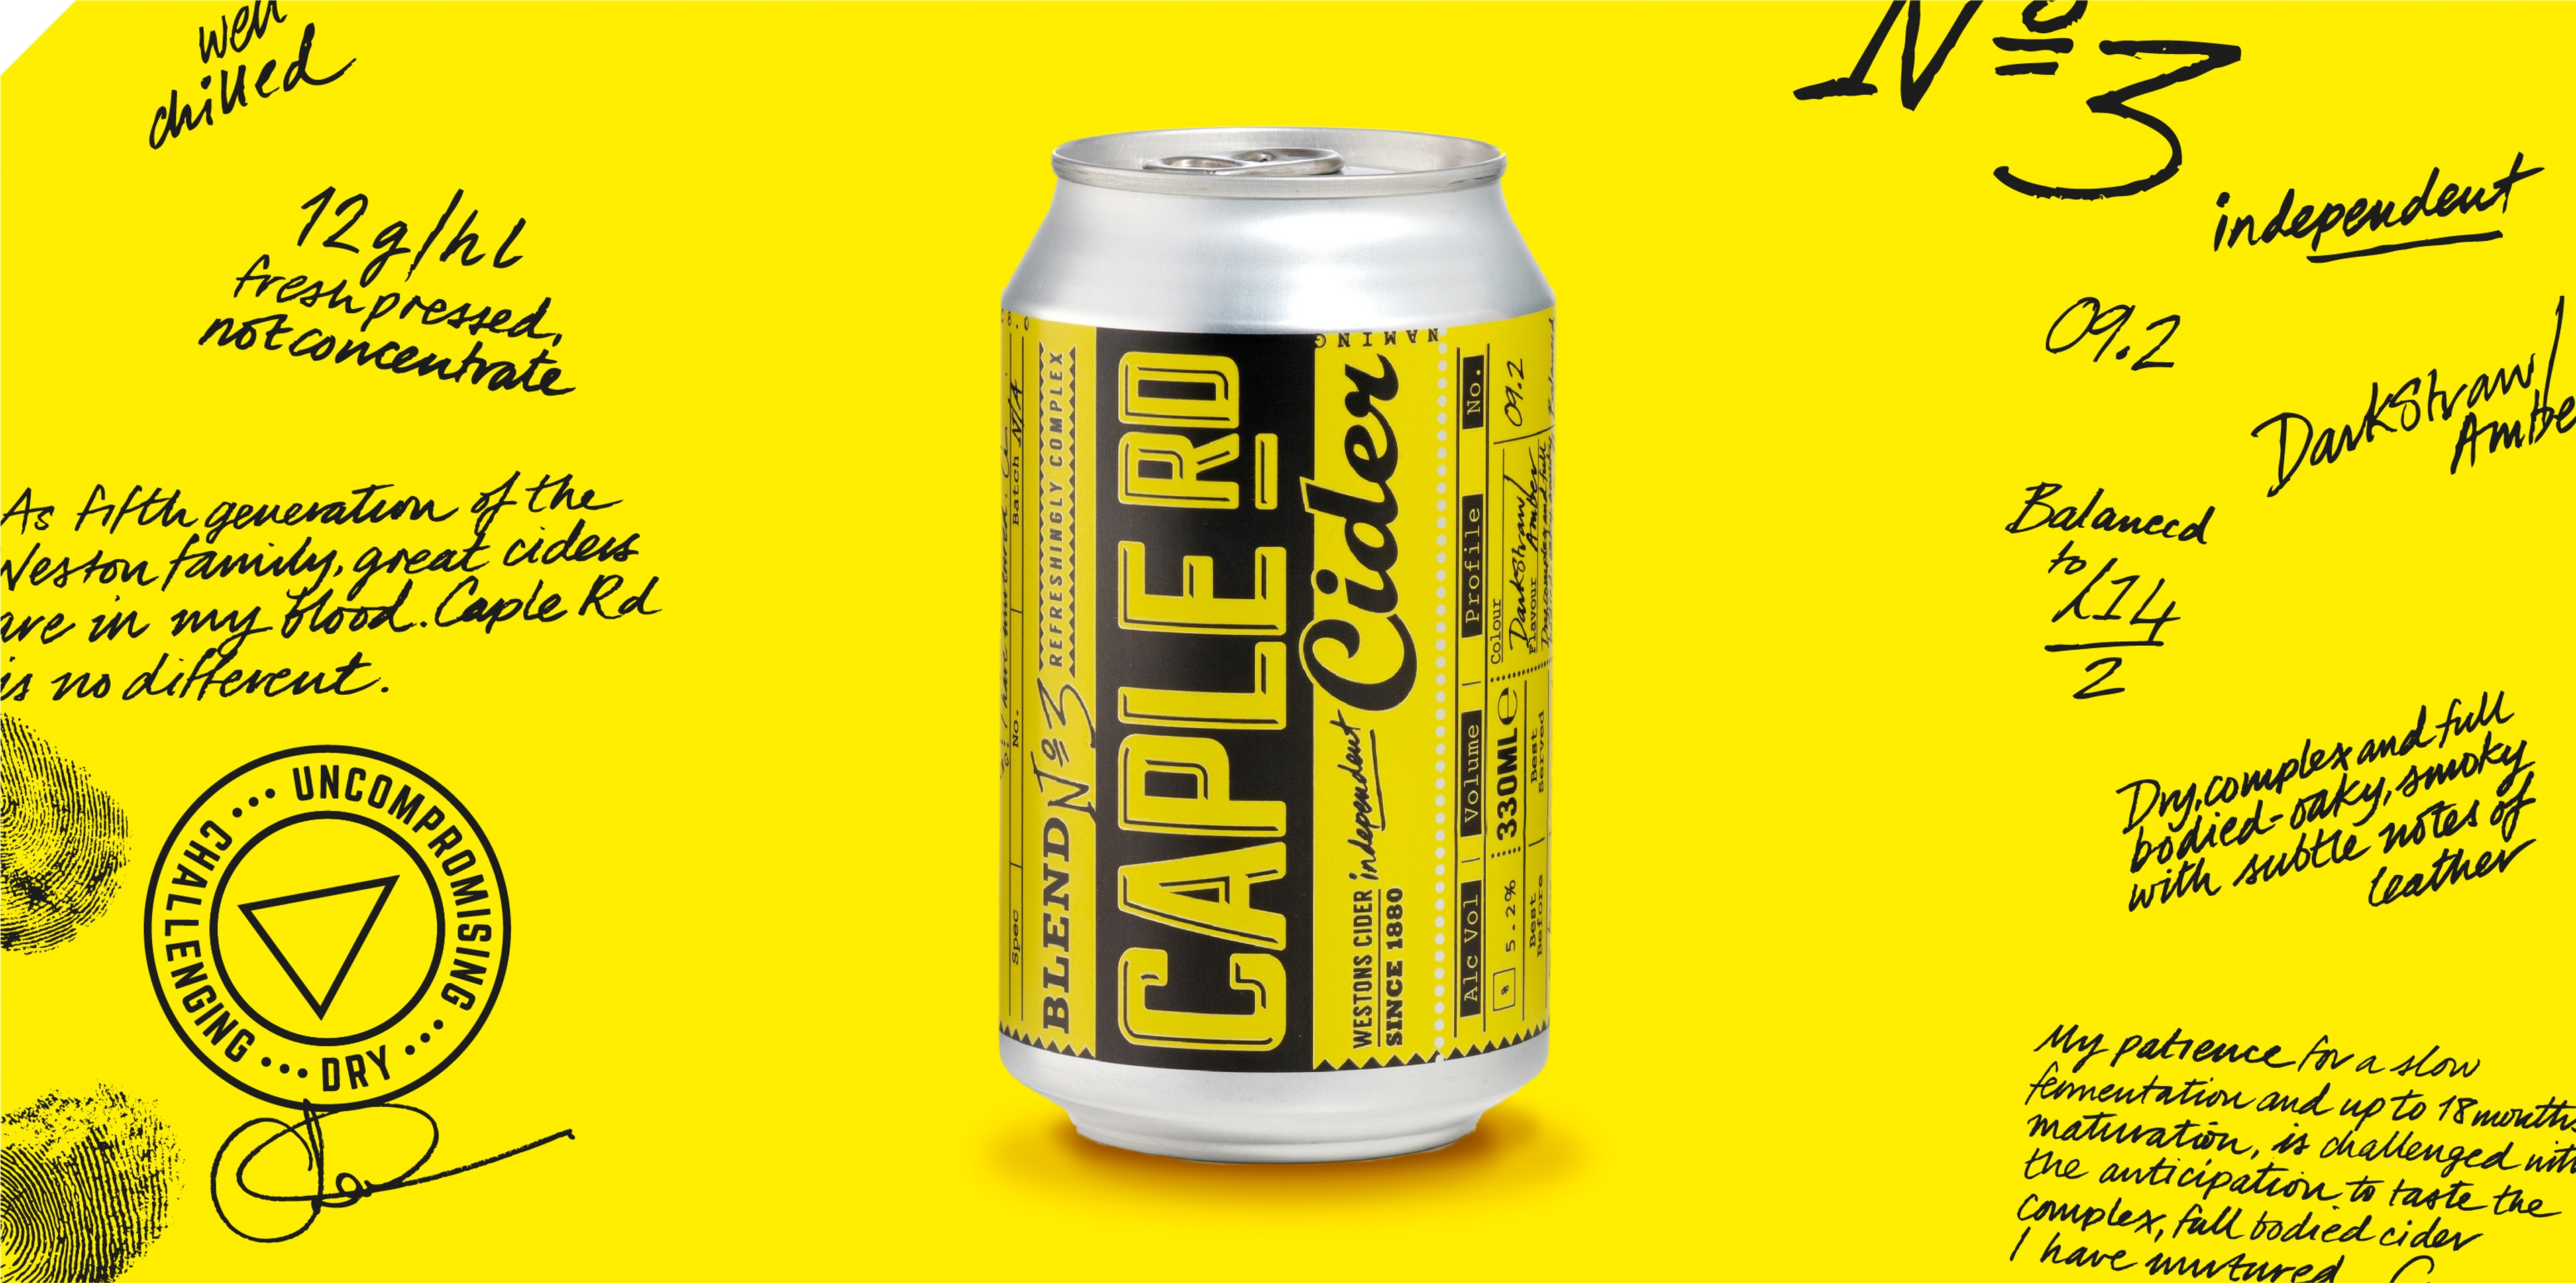 Brand on Shelf - Work - Westons Cider - Caple Rd Cider